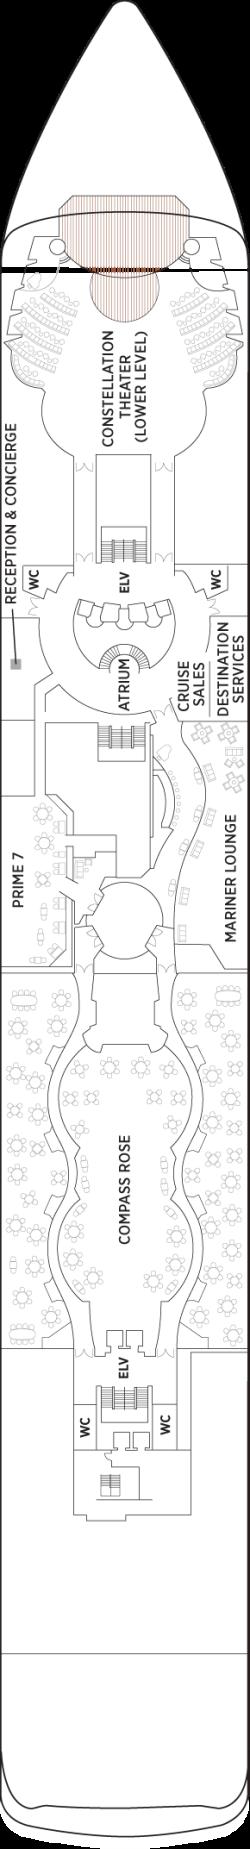 Seven Seas Mariner Deck 5: Deck 5